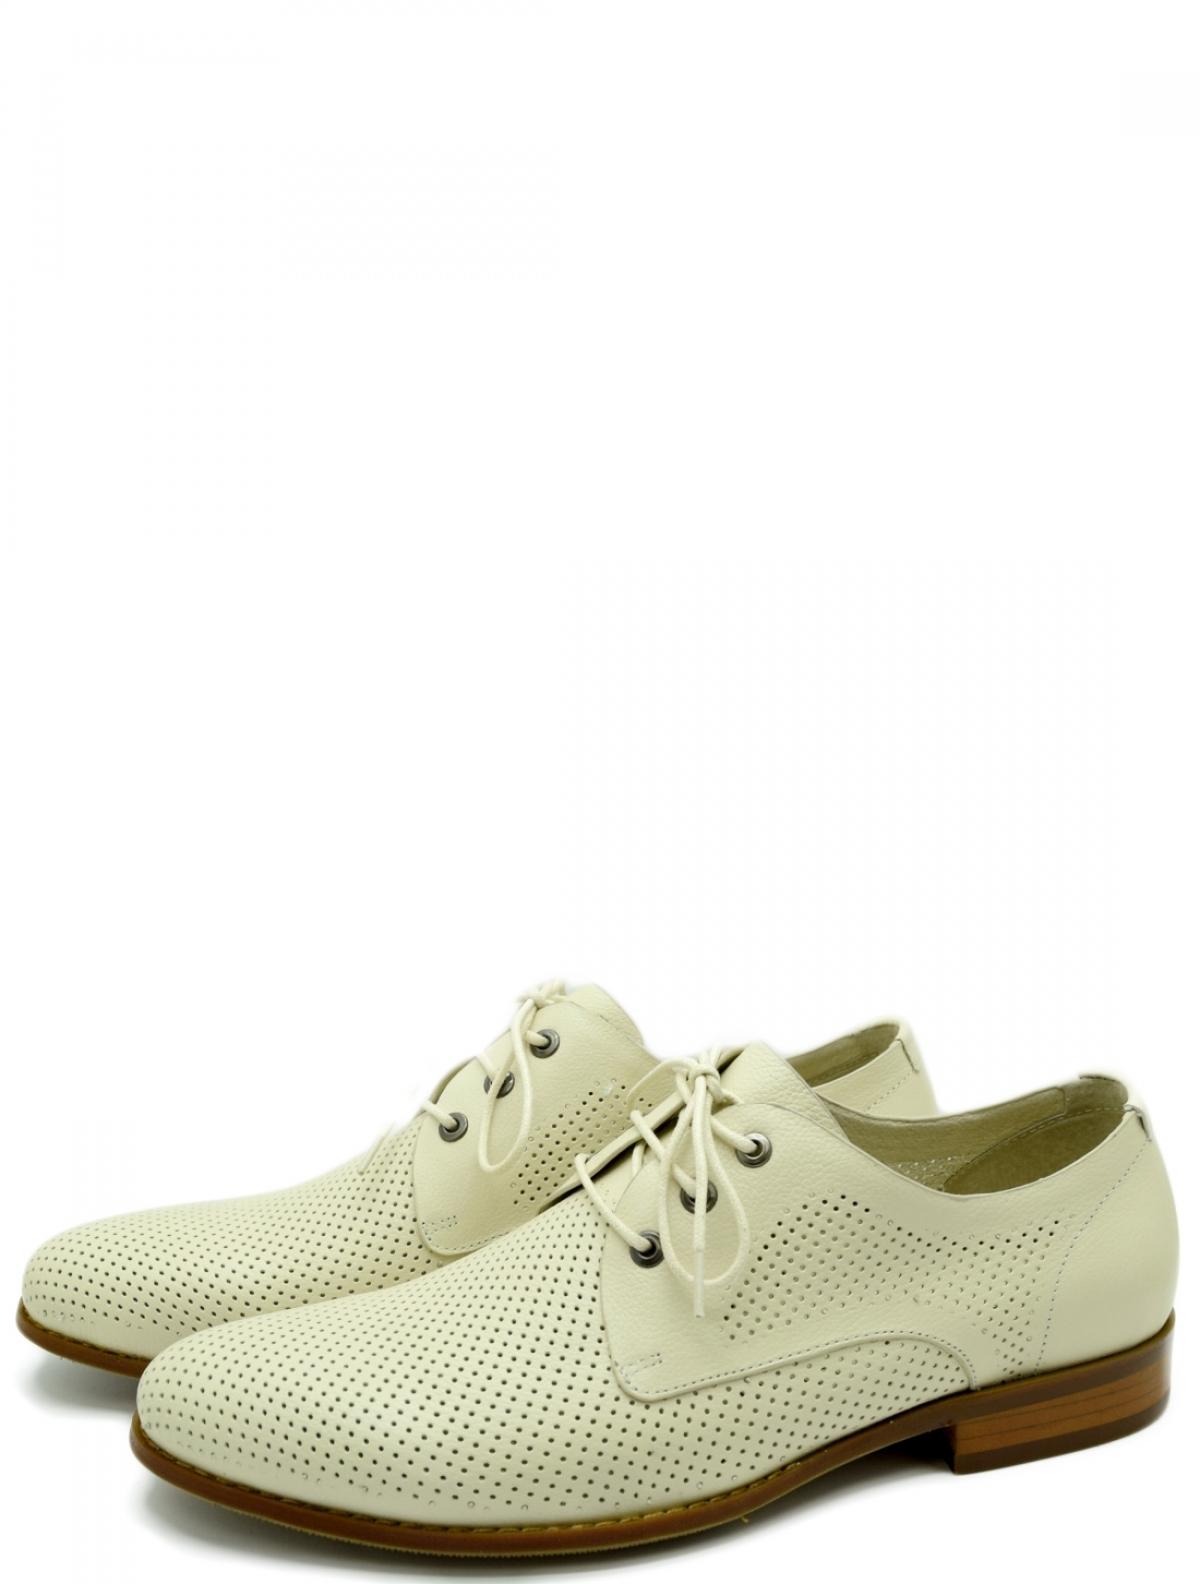 Rosconi R73001YC-217-6685C мужские туфли